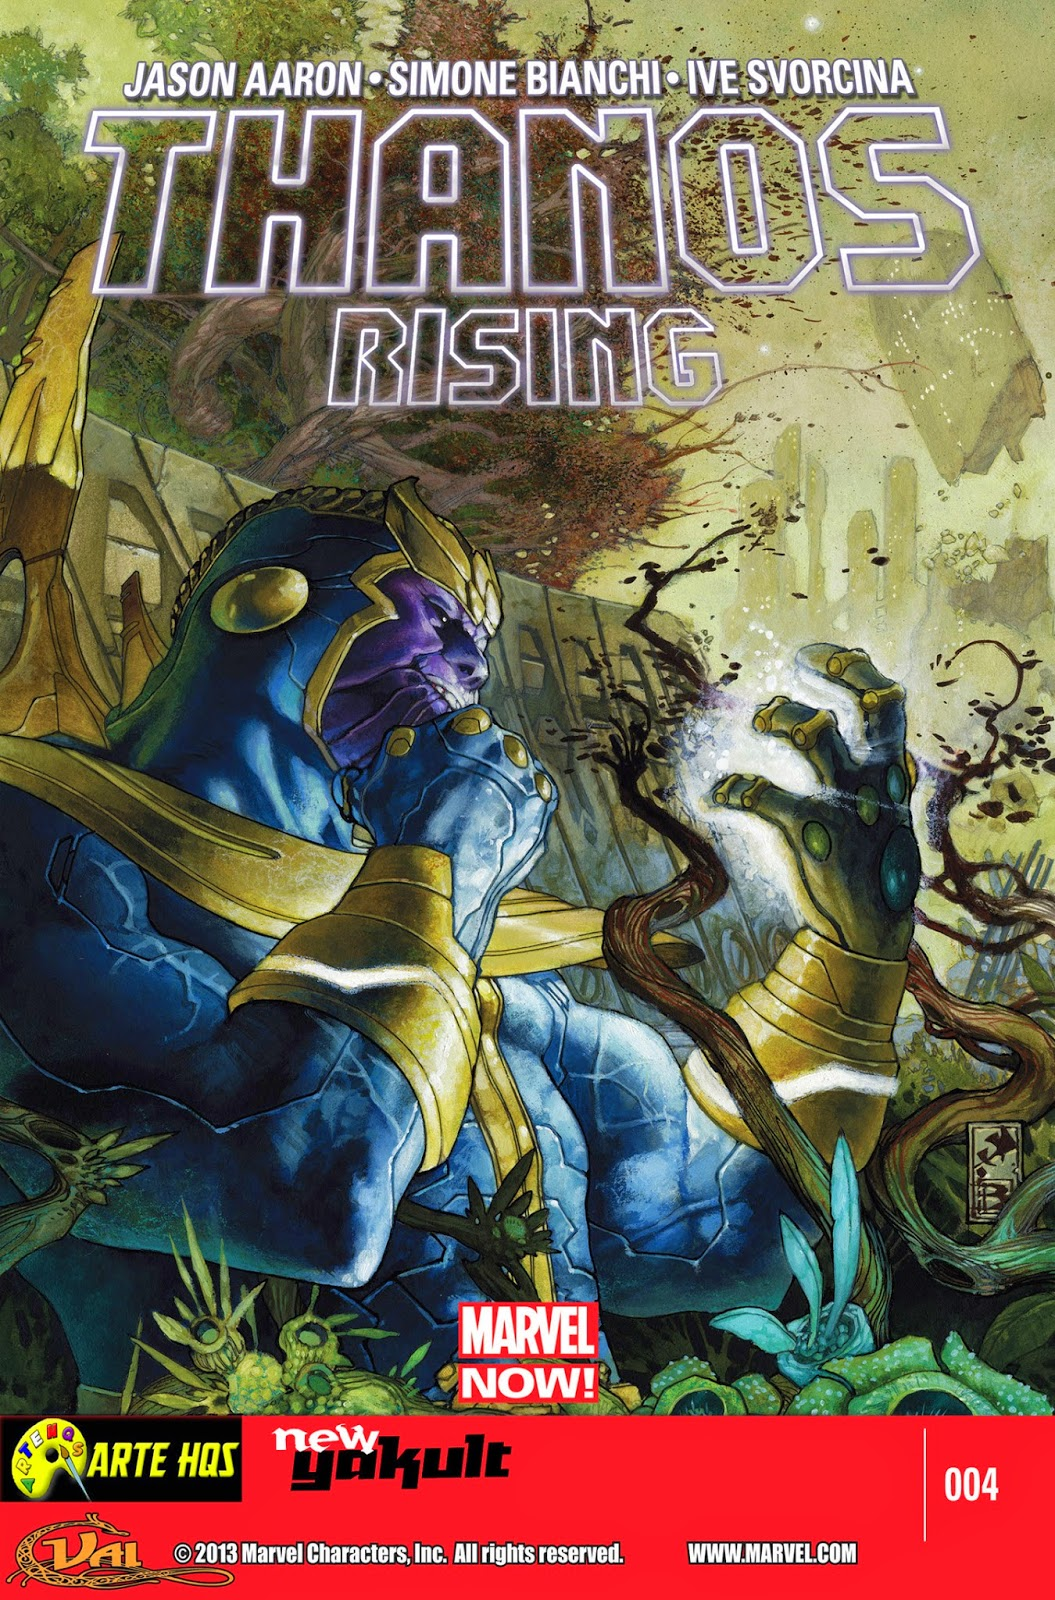 Nova Marvel! Thanos Rising #4